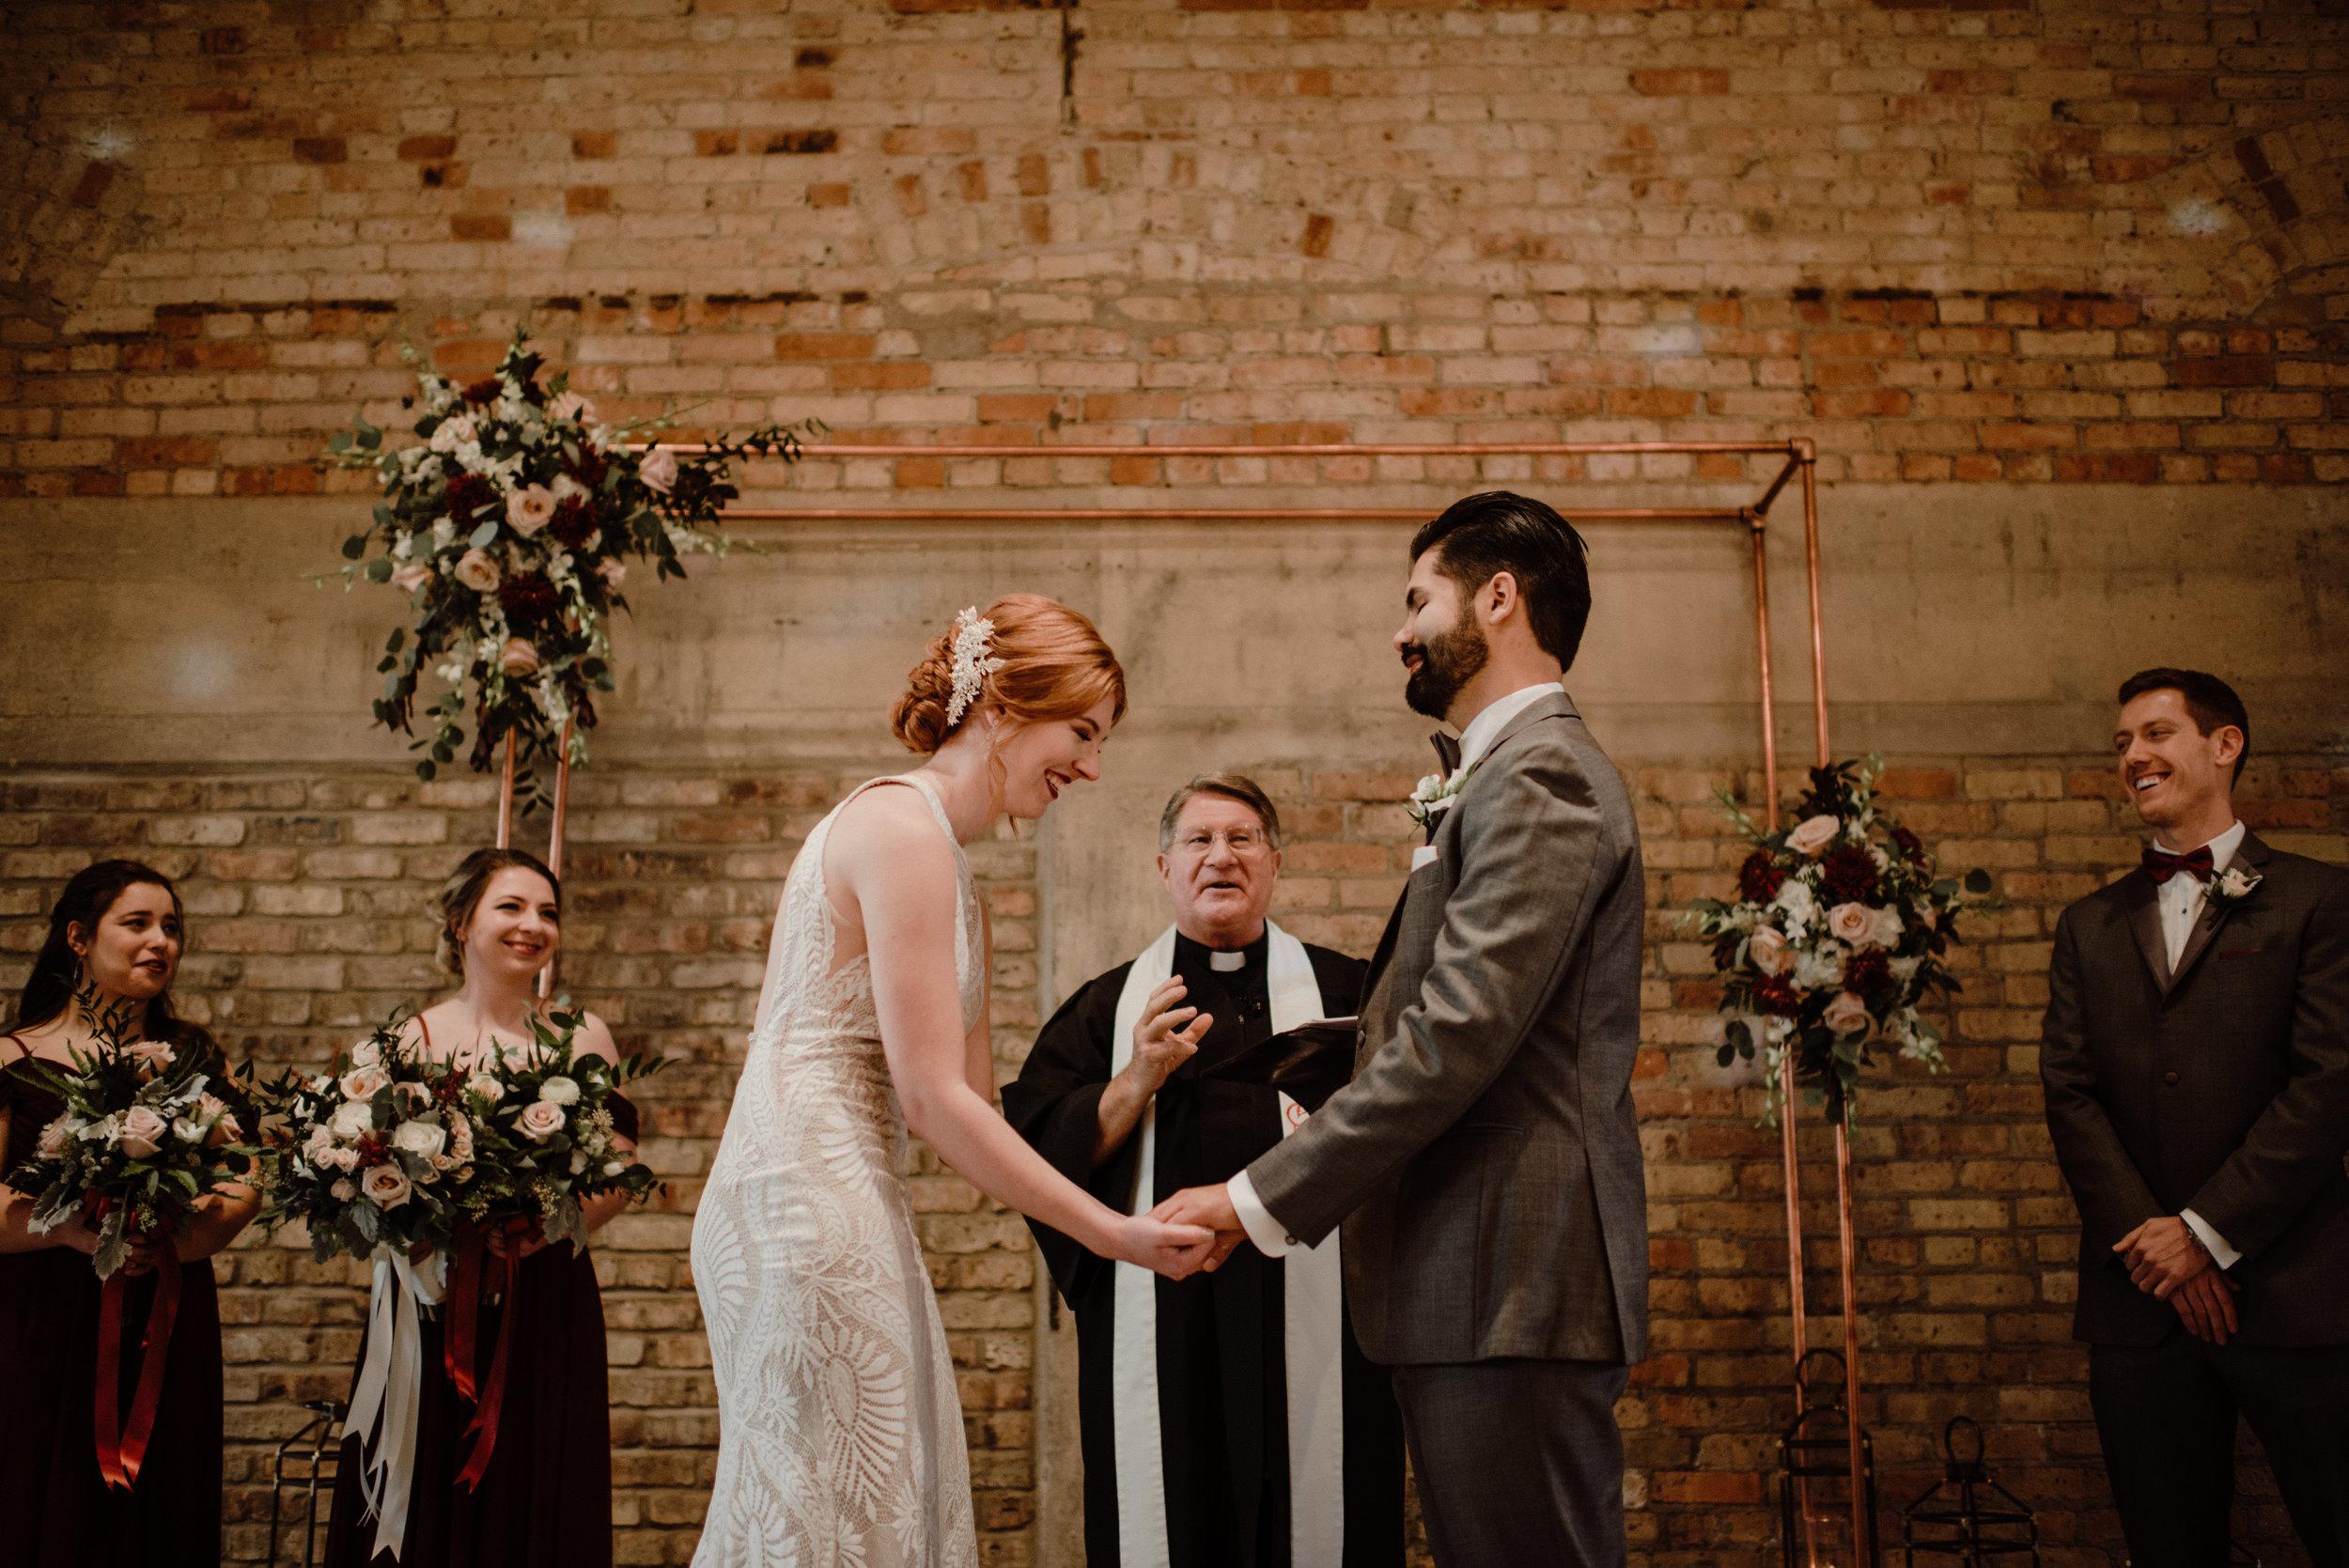 The Brix on Fox, Chicago Wedding Photographer, Zach and Rosalie00006.jpg